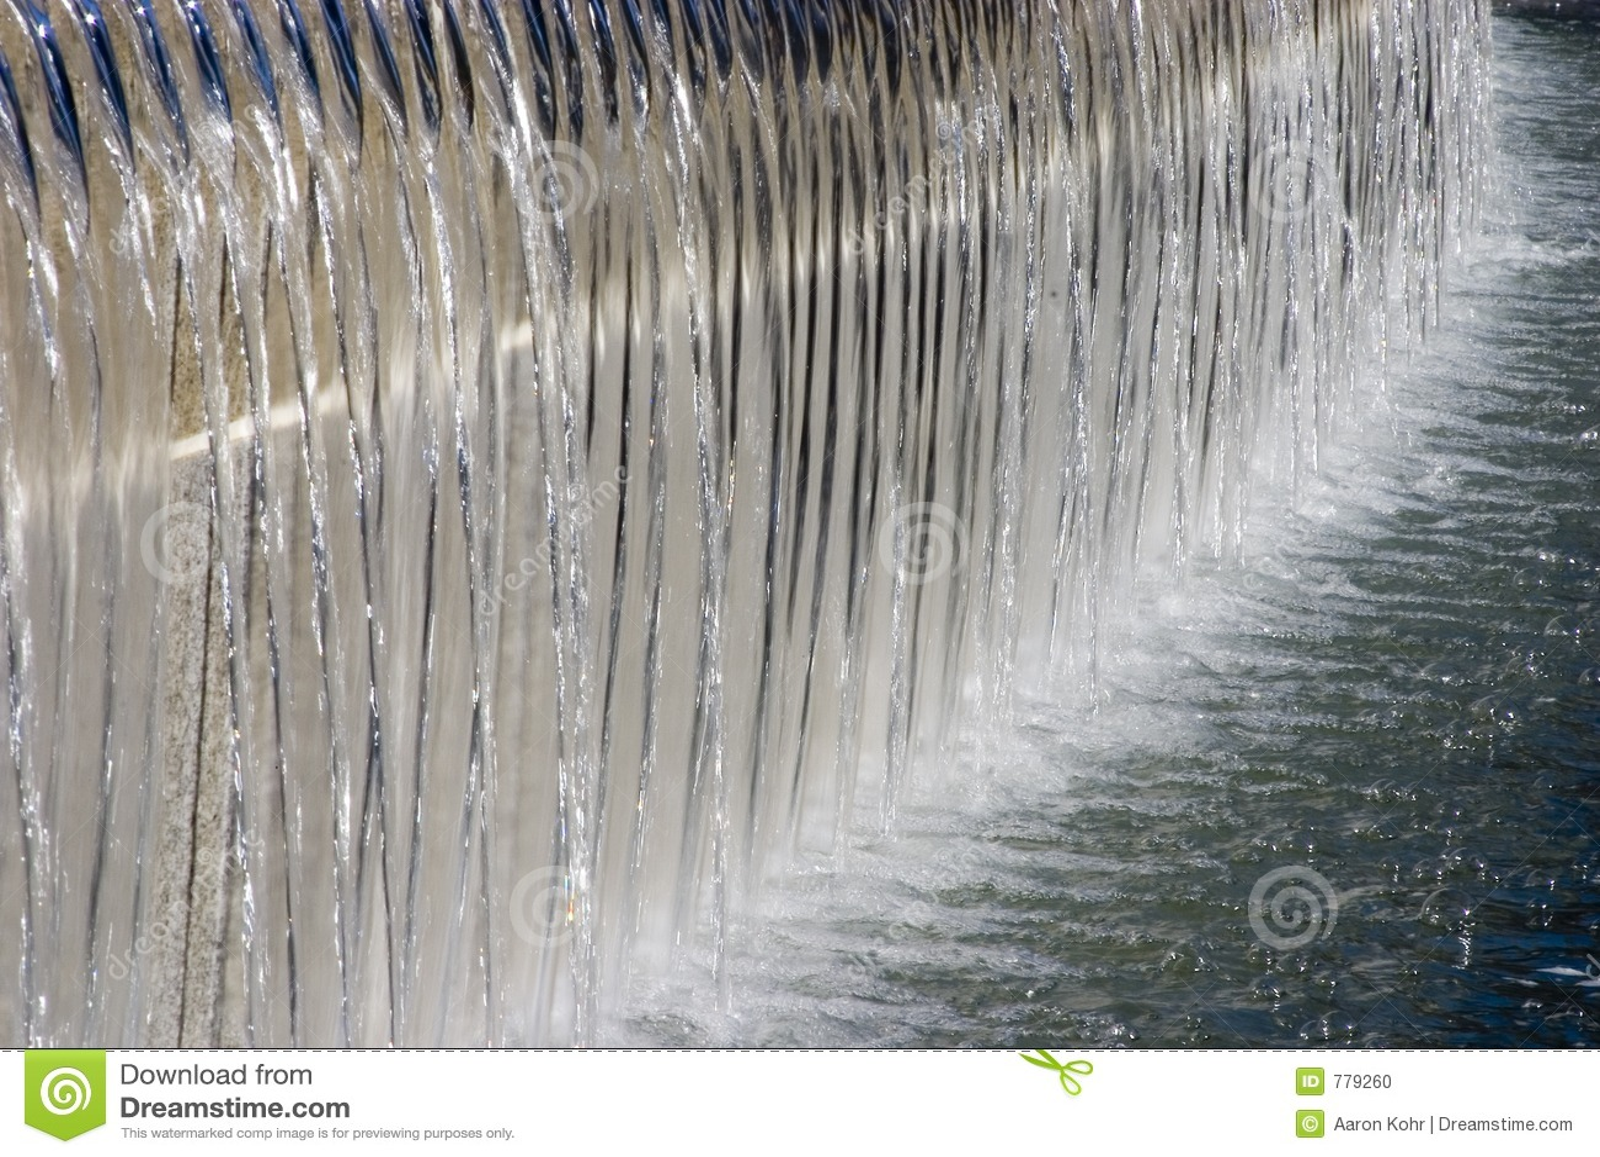 city fountain park waterfall - Waterfall Fountain